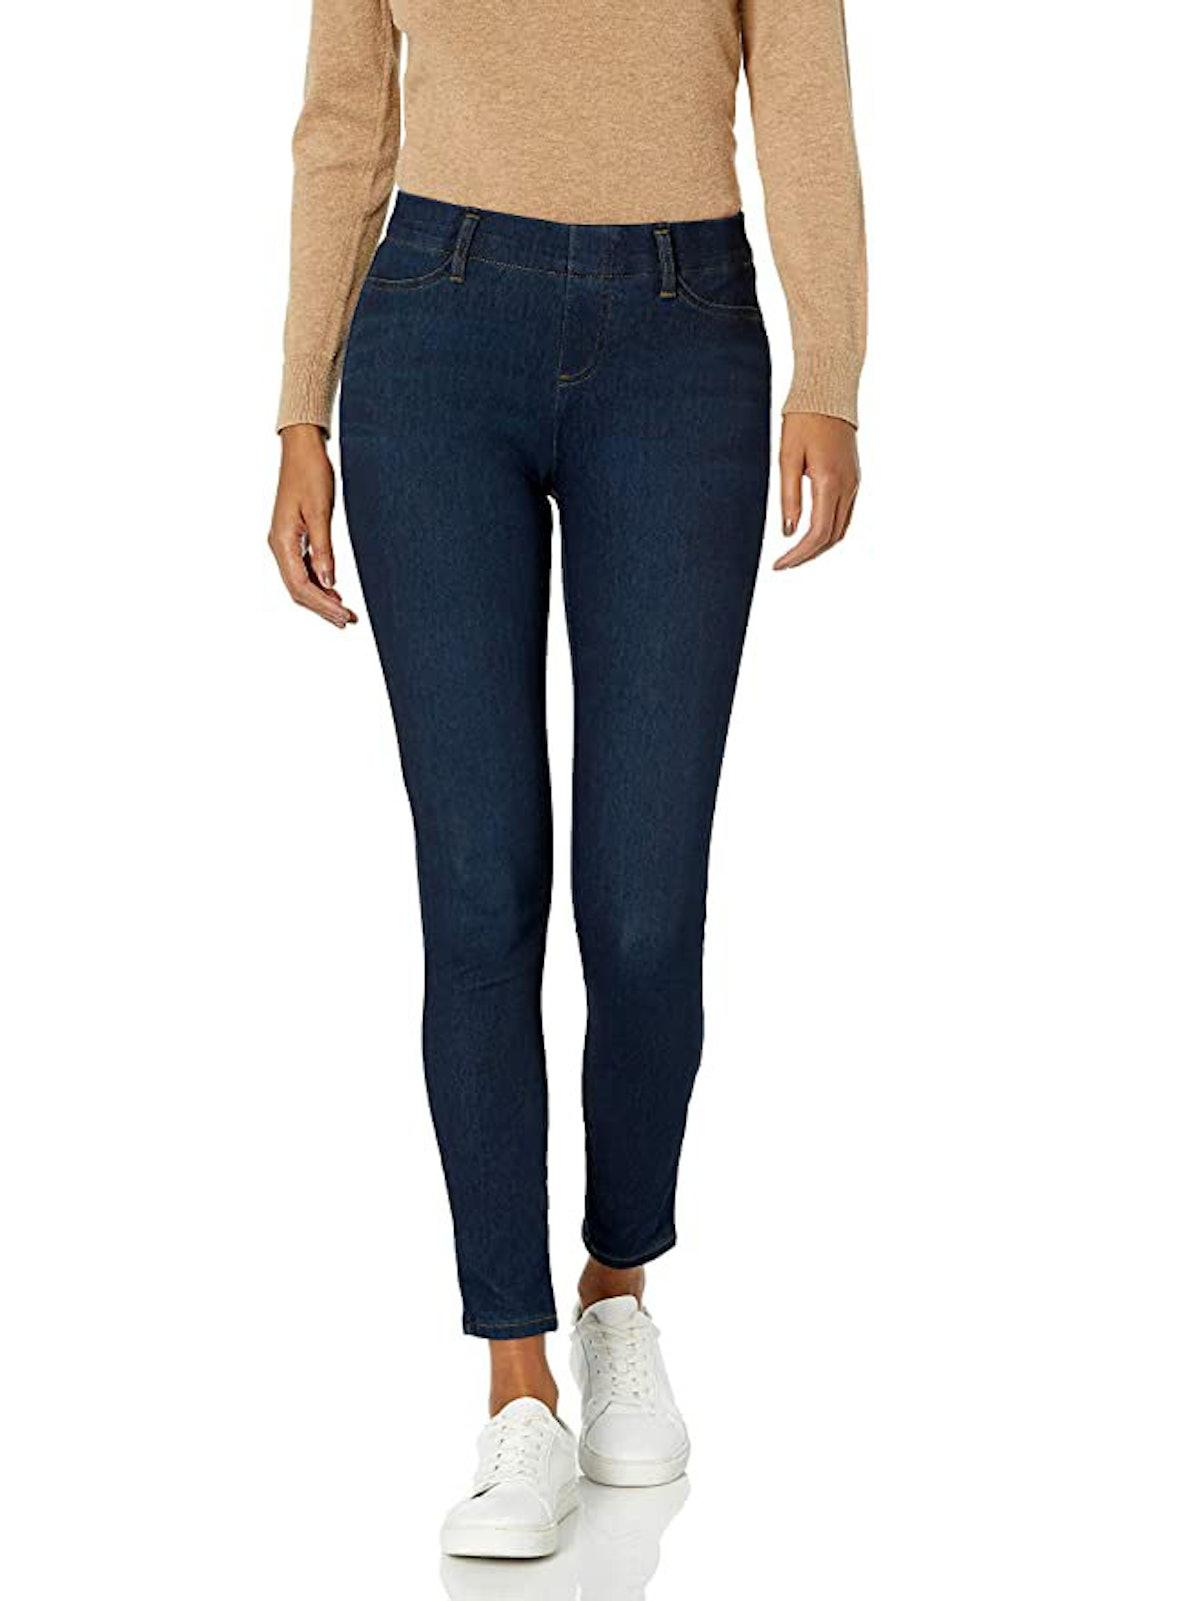 Amazon Essentials Knit Skinny Jeans